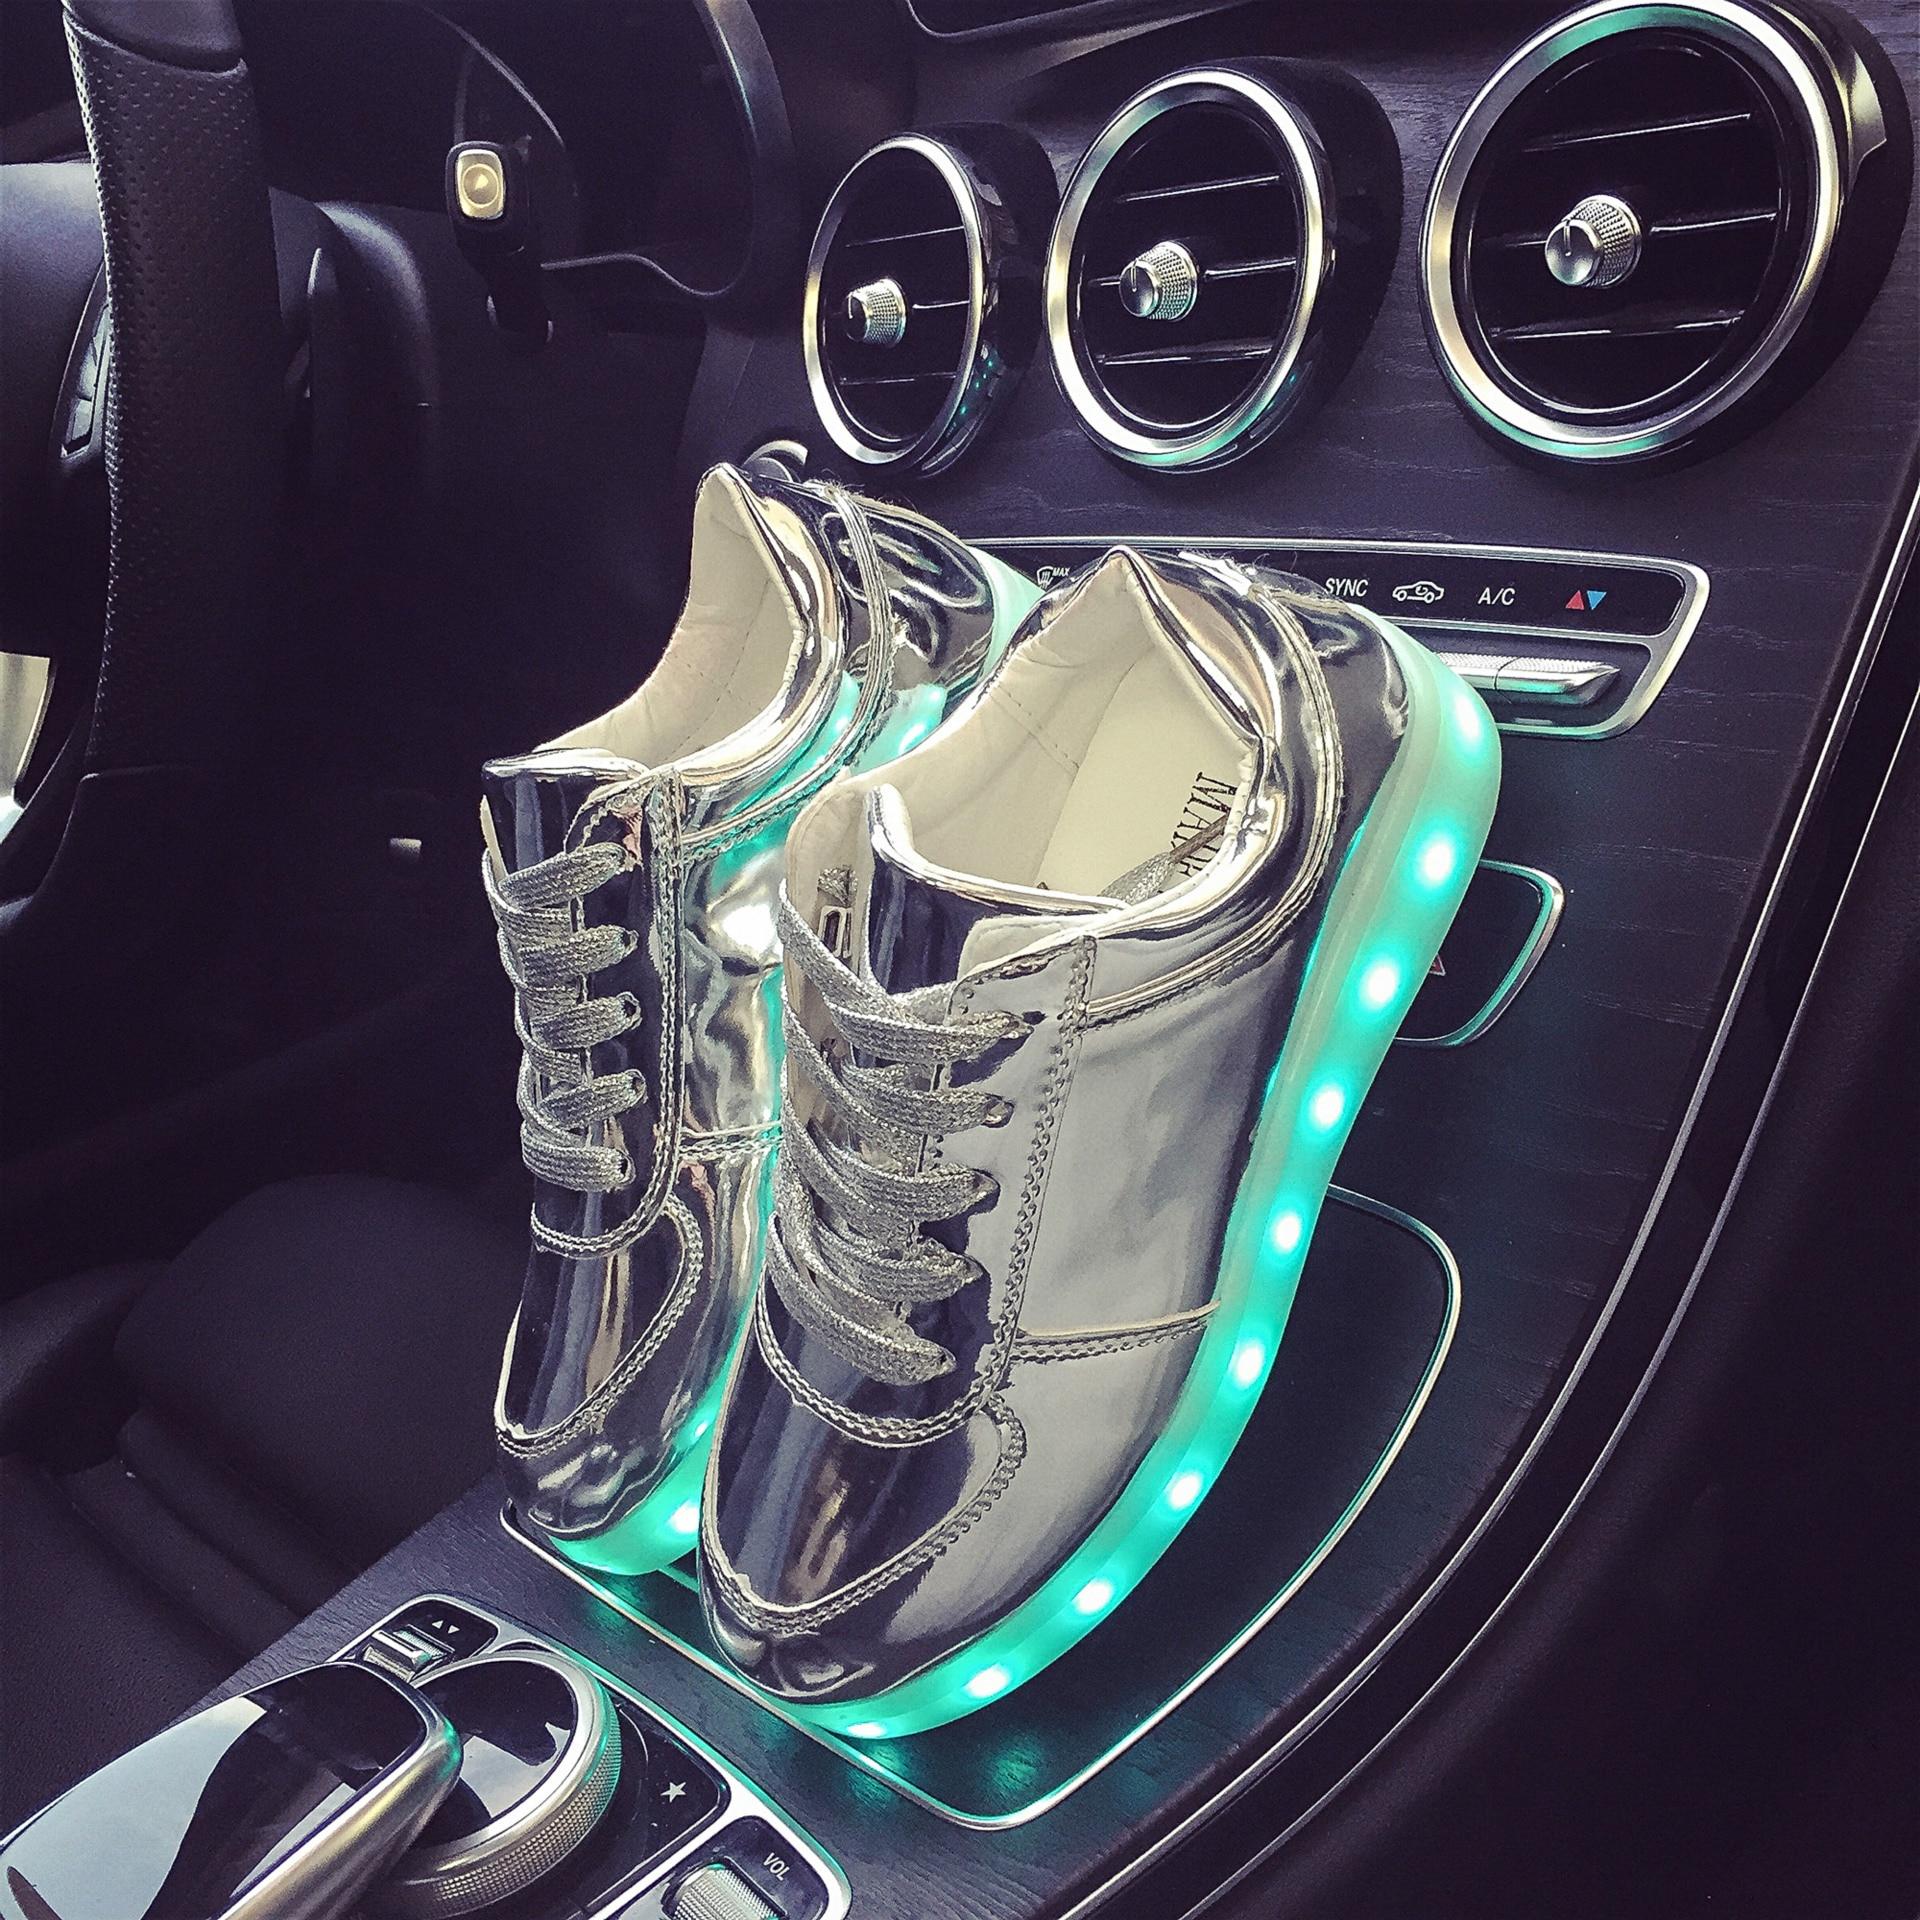 best service 988f3 a2014 Eur Größe 27-42 7 Farben Leucht Turnschuhe Glowing Jungen LED Schuhe  Mädchen Kind LED Hausschuhe Licht Up Schuhe für Männer Frauen